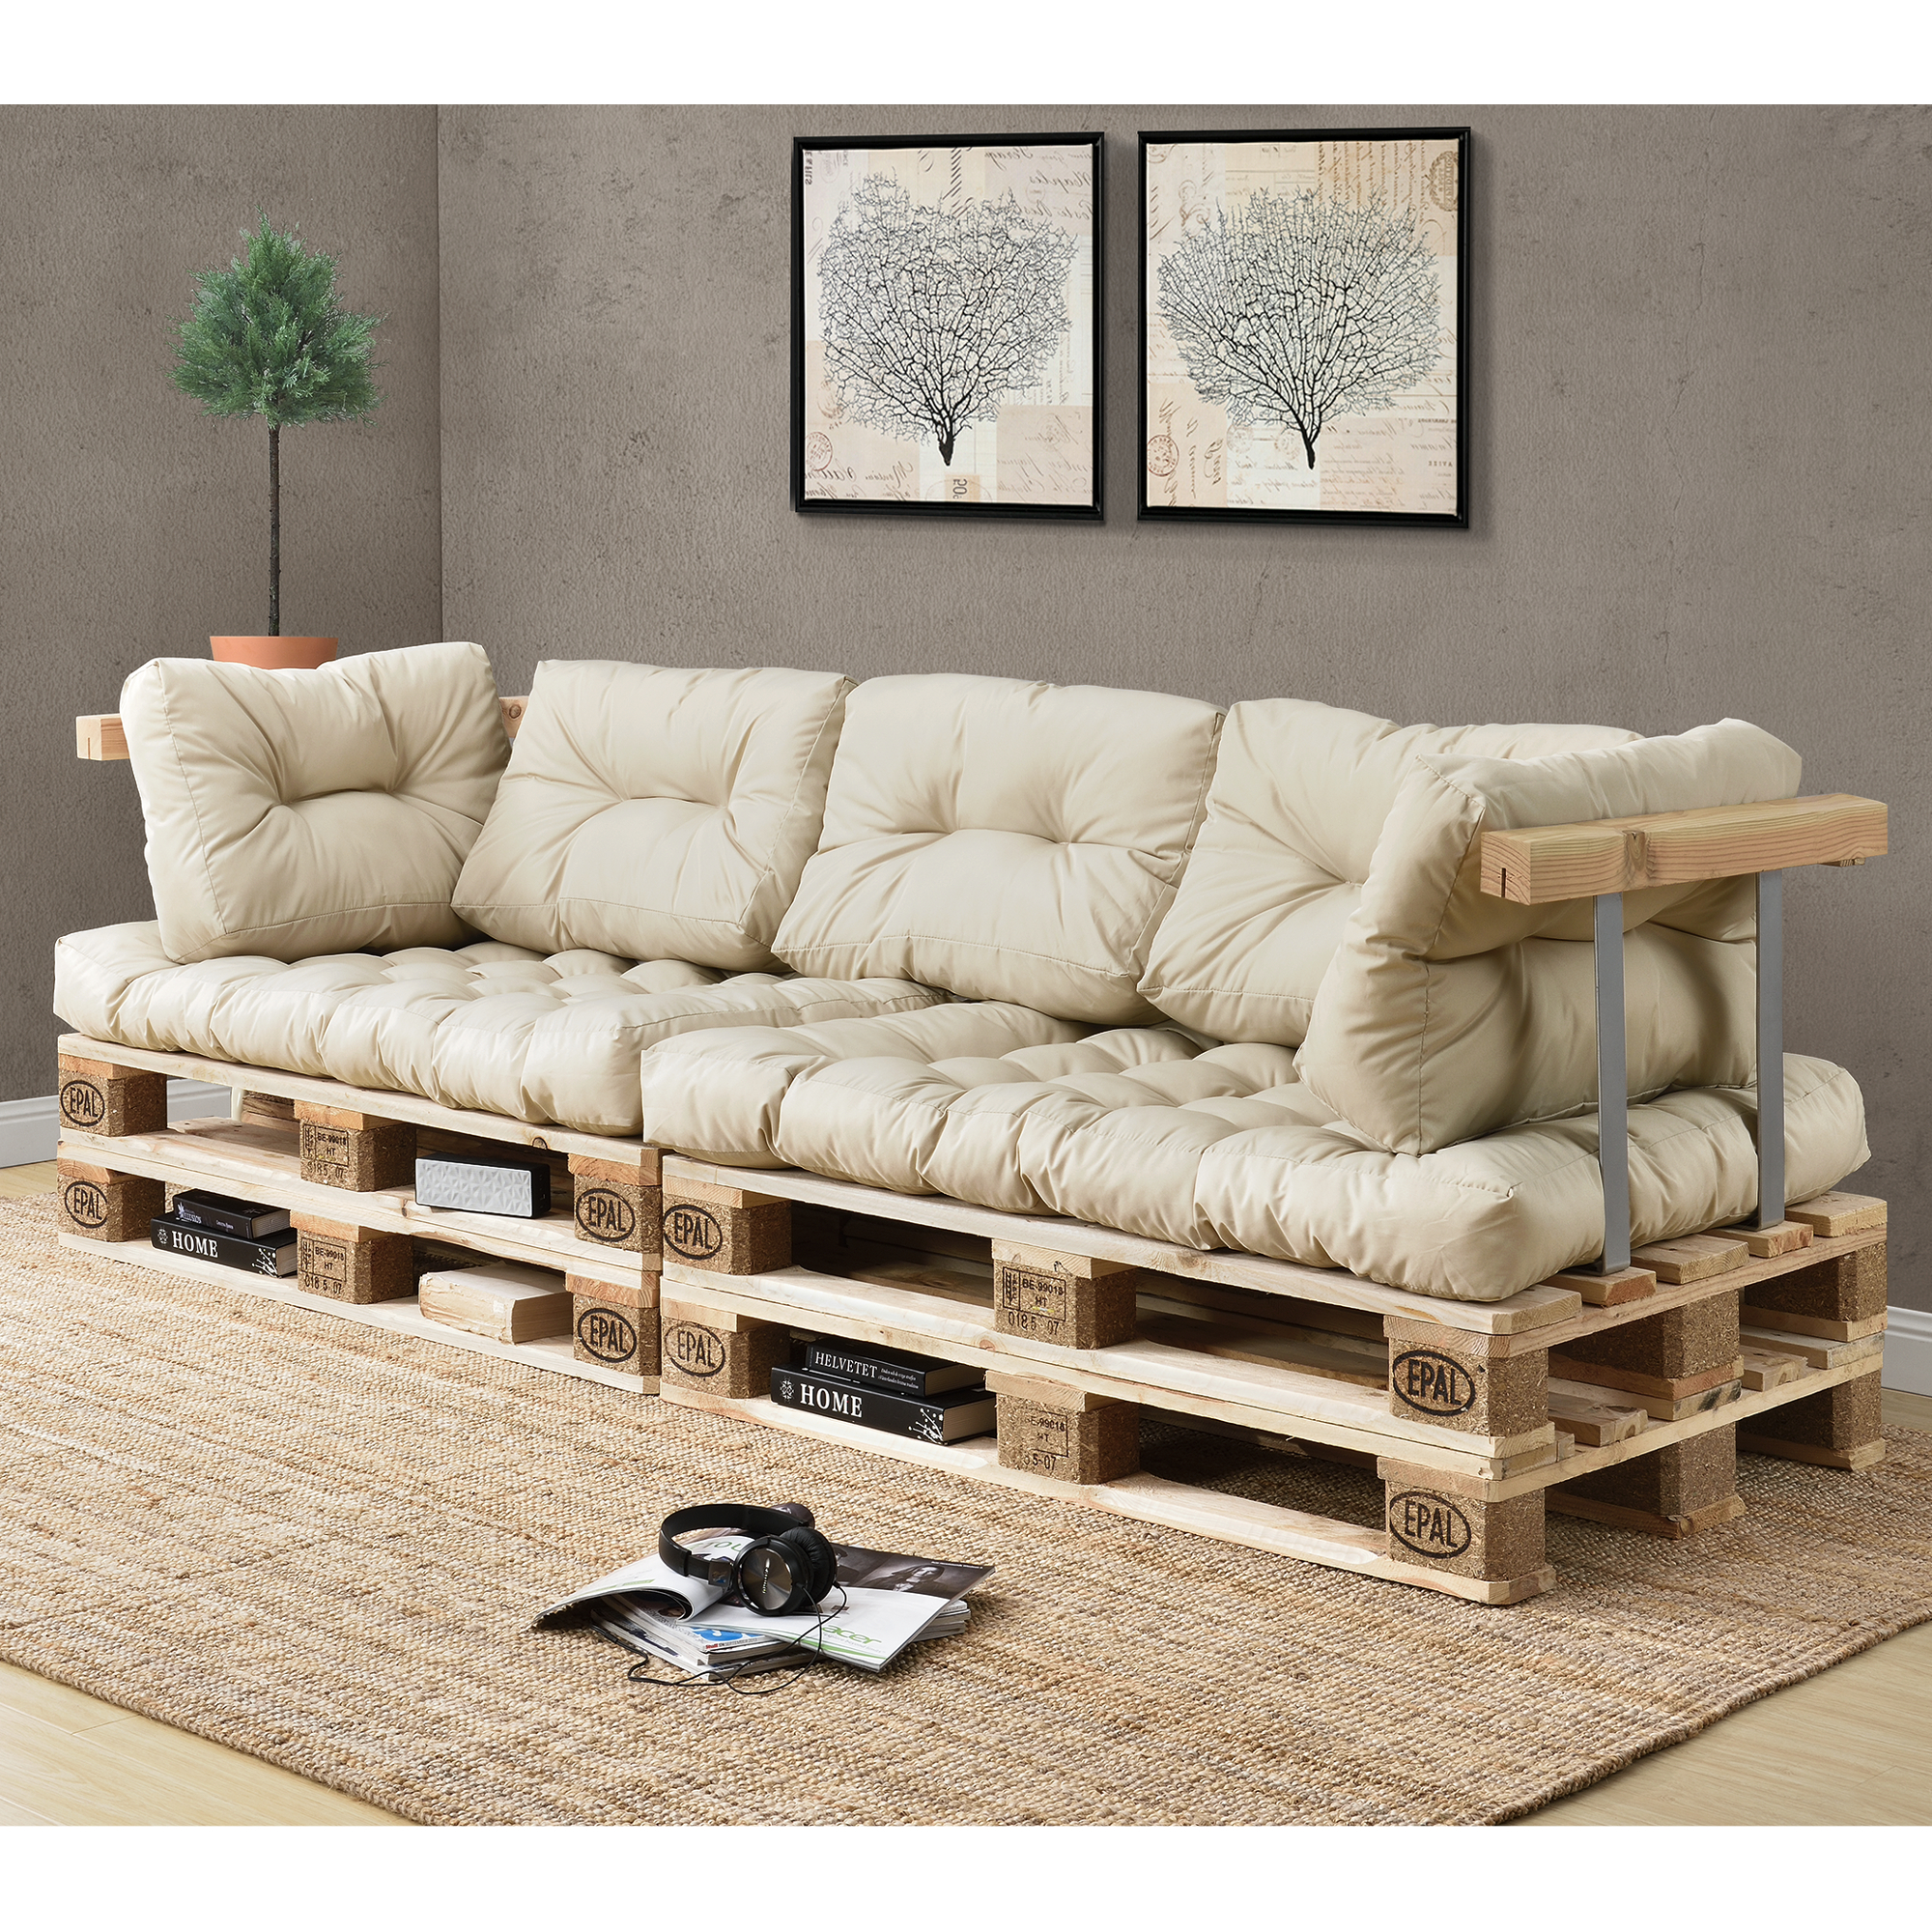 1x sitzpolster palettenkissen in outdoor. Black Bedroom Furniture Sets. Home Design Ideas